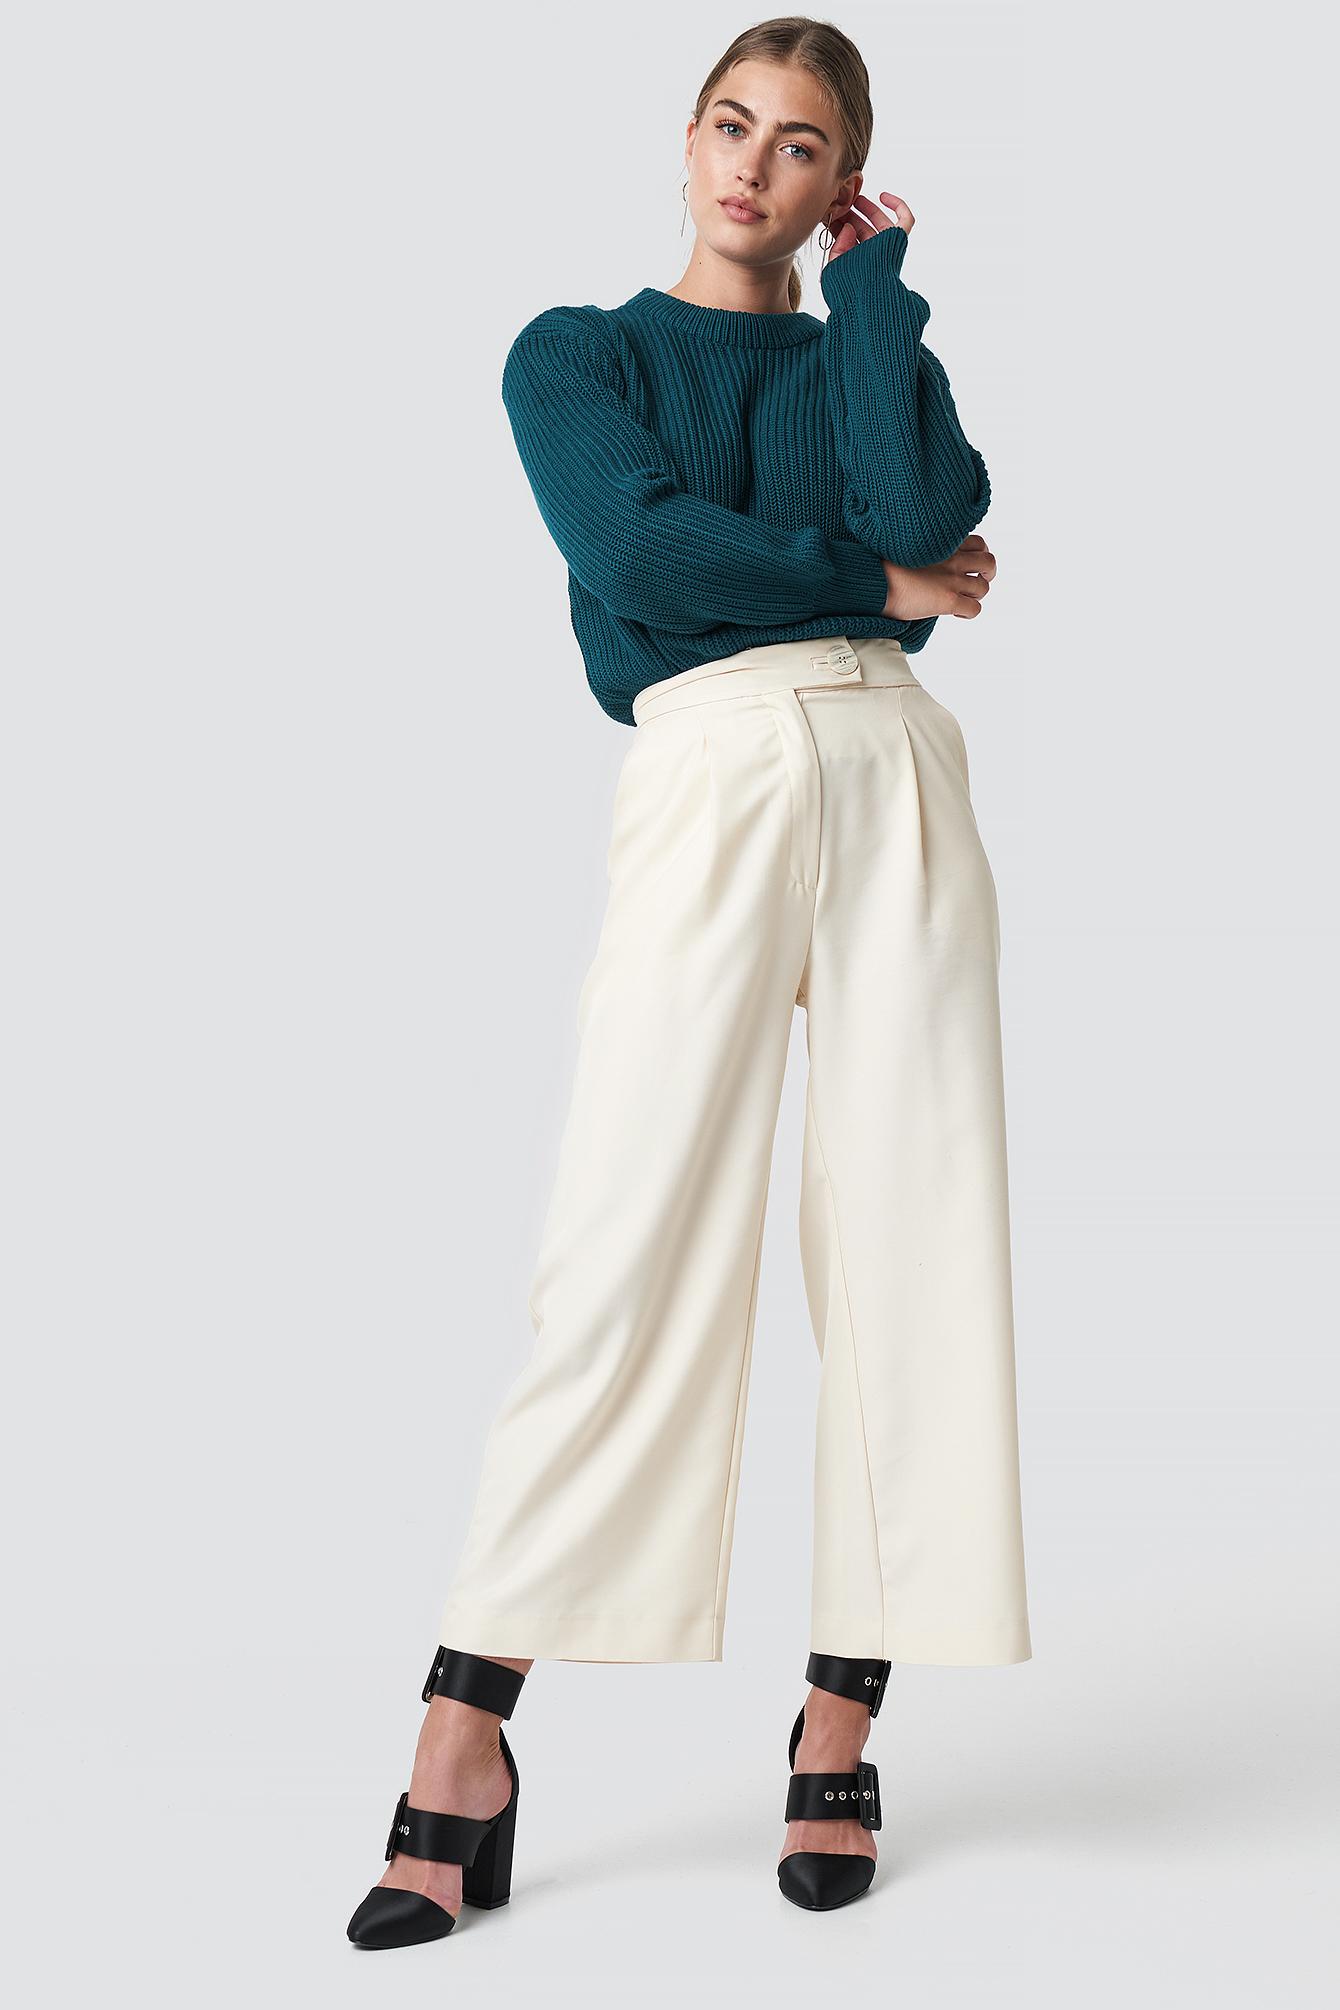 Mikala Jumper NA-KD.COM